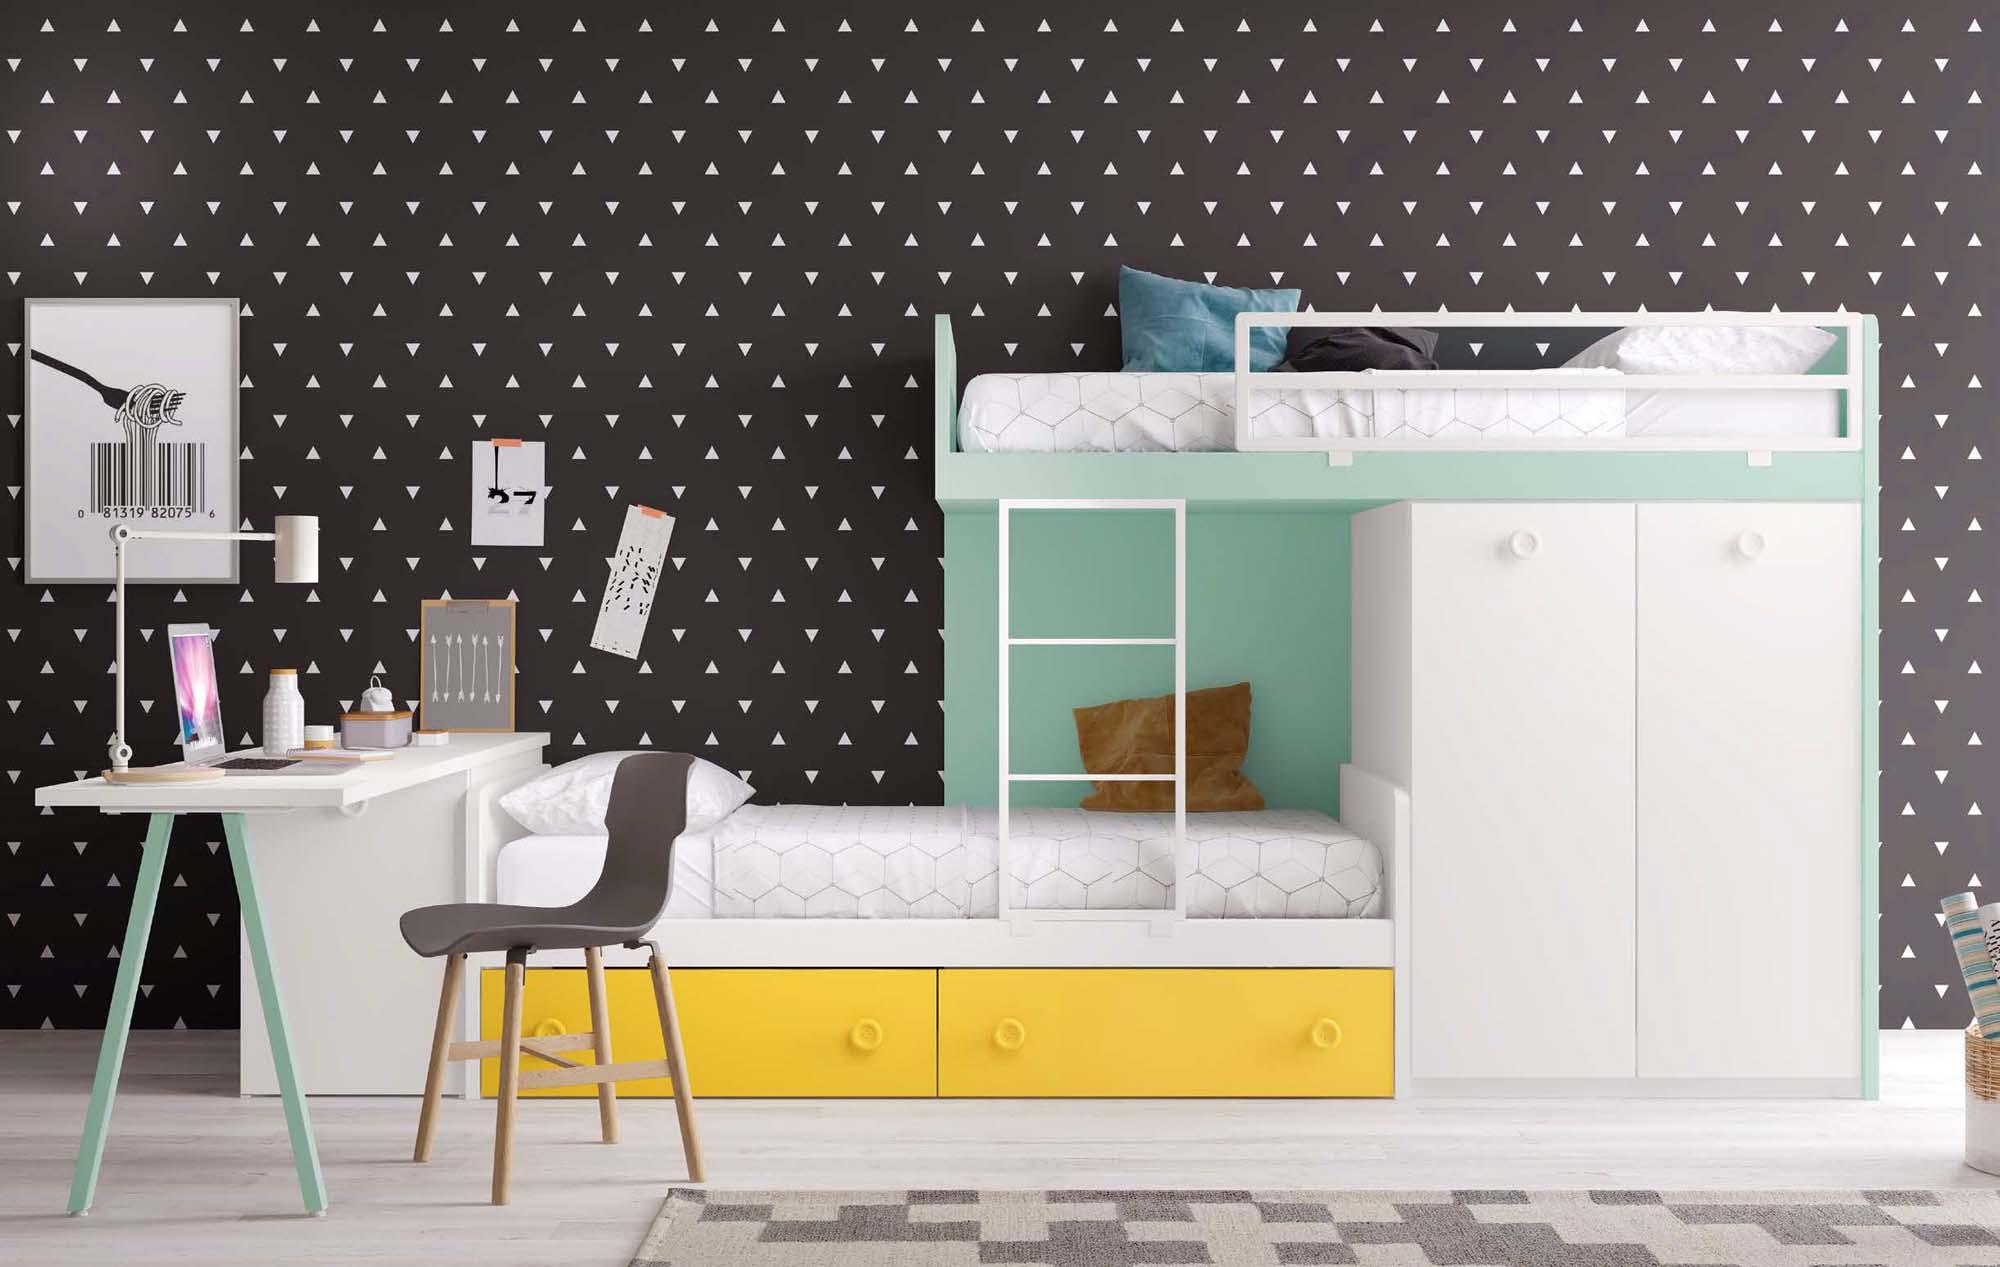 finest lits superposs enfants f glicerio with lits jumeaux. Black Bedroom Furniture Sets. Home Design Ideas